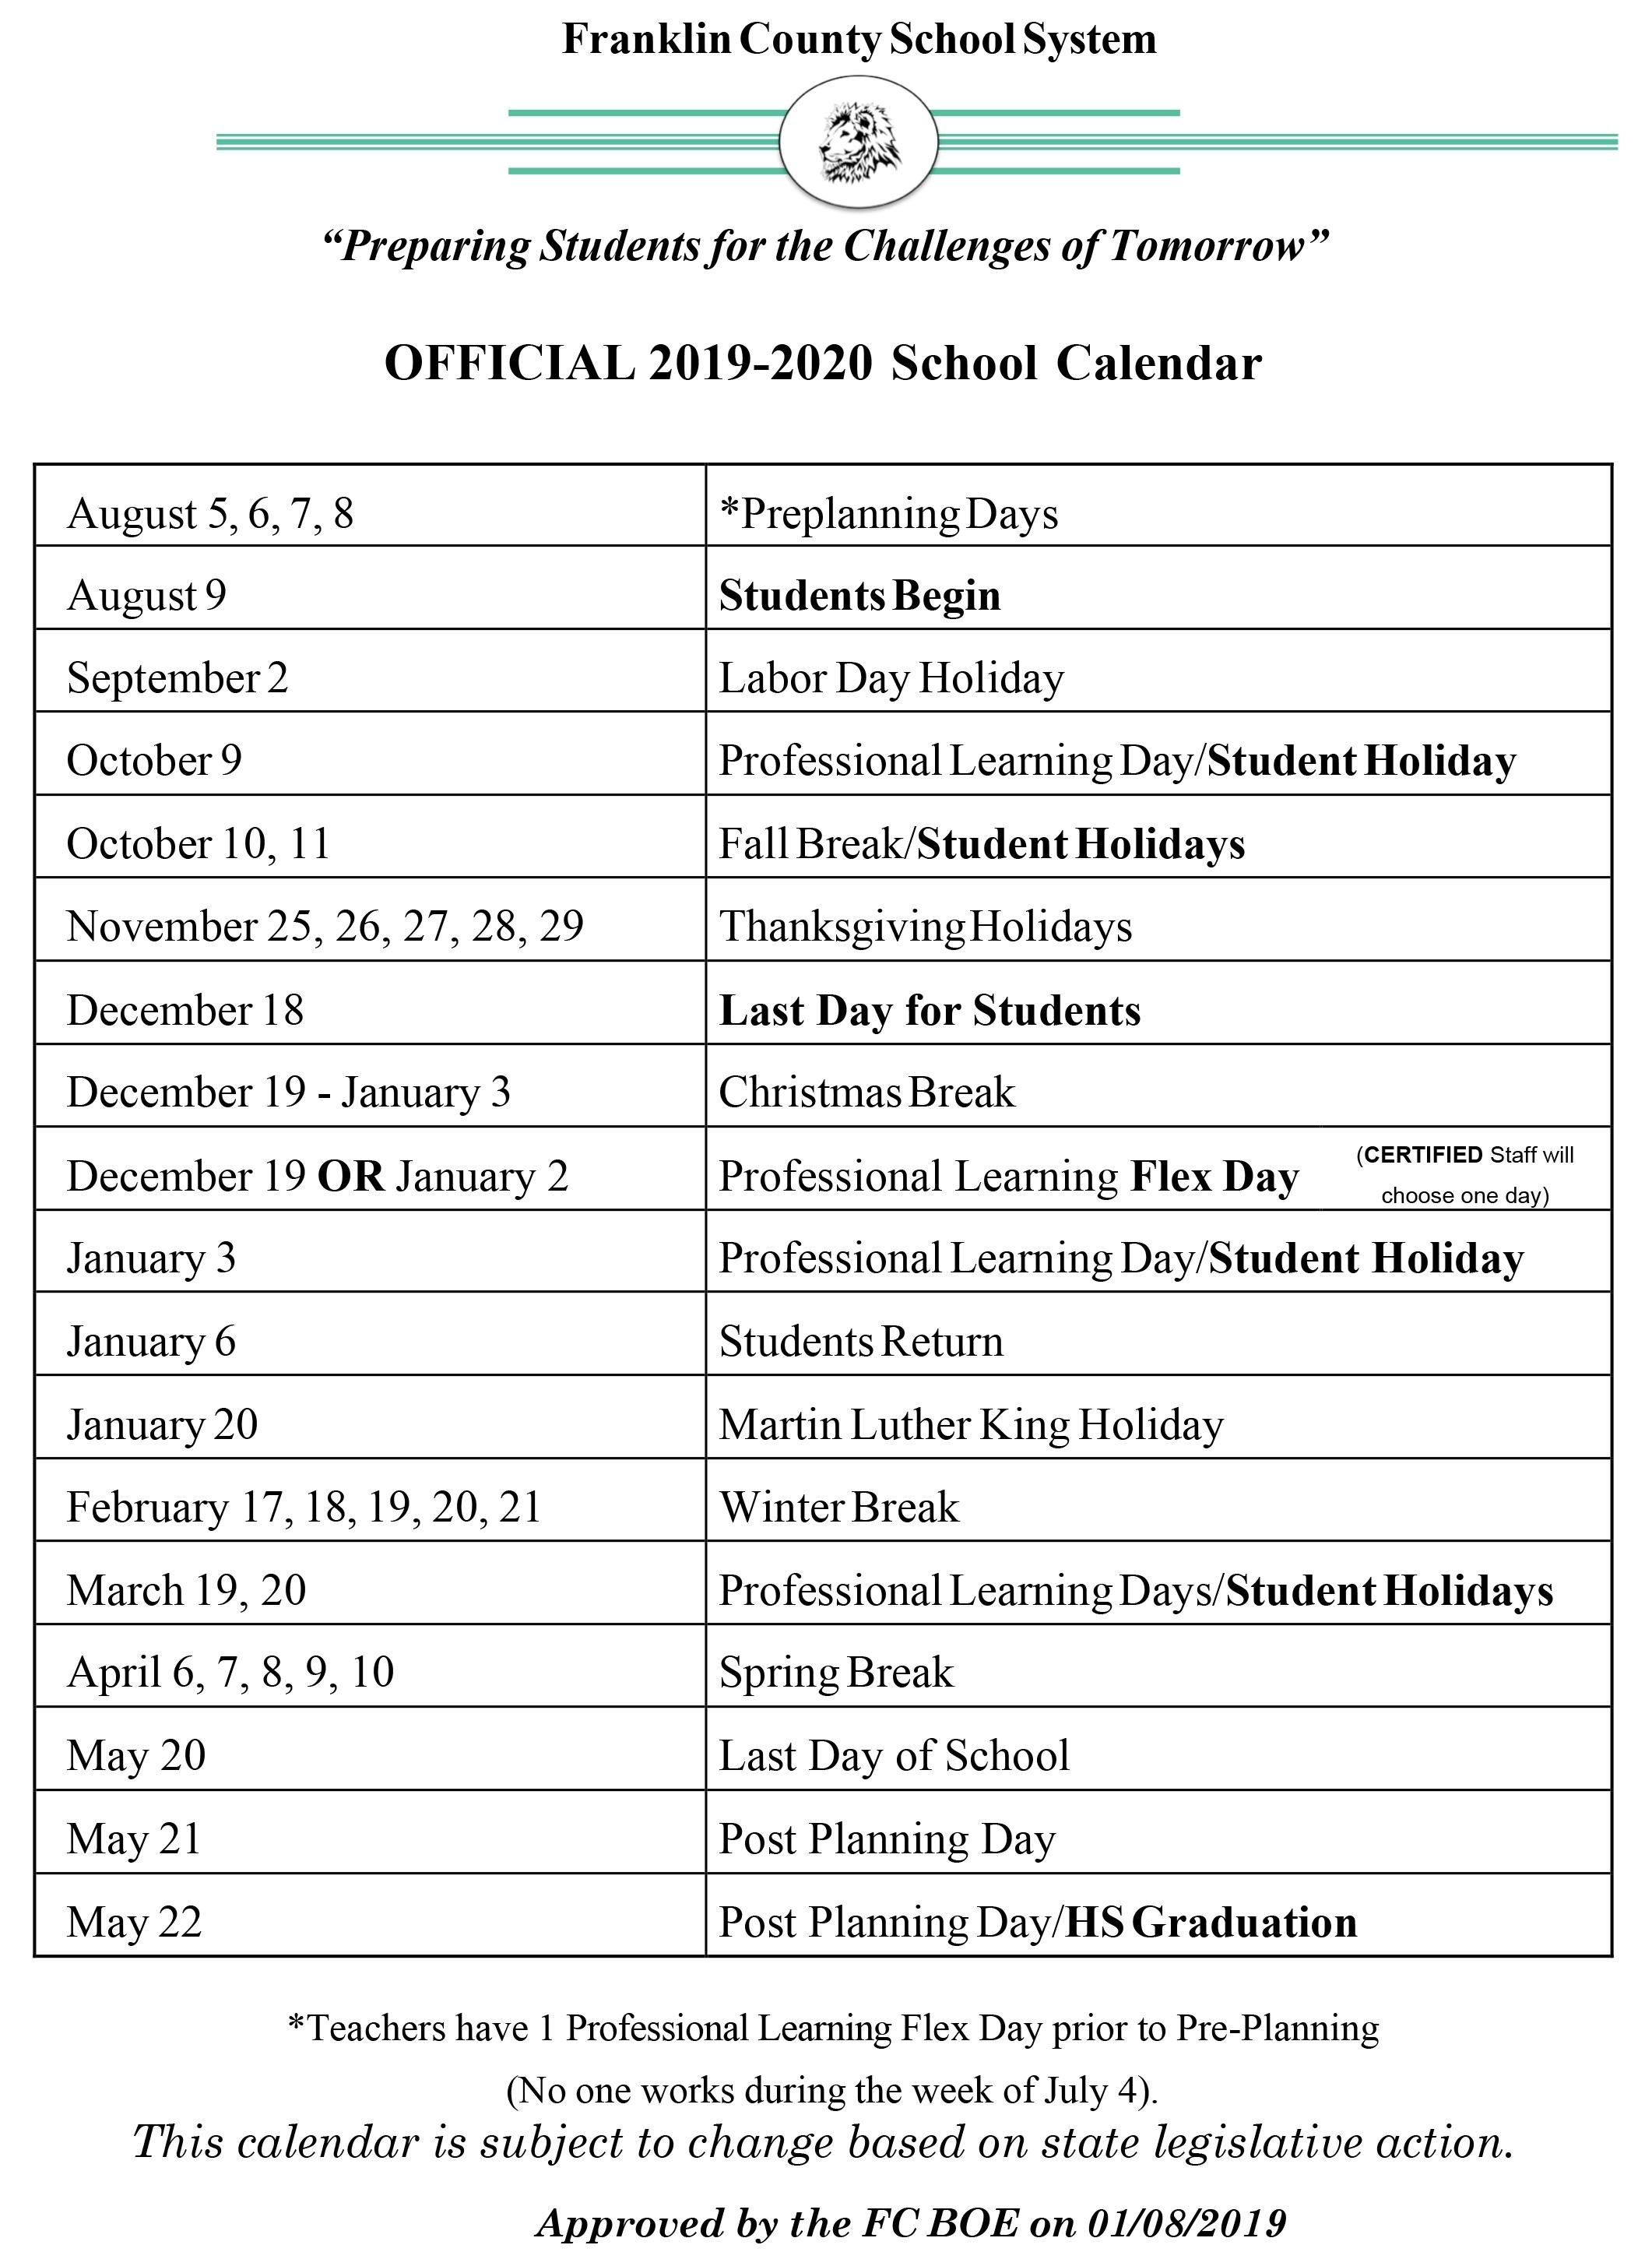 School Board Sets 170-Day Calendar For 2019-20 Year | Franklin Dashing November 3 2020 Calendar